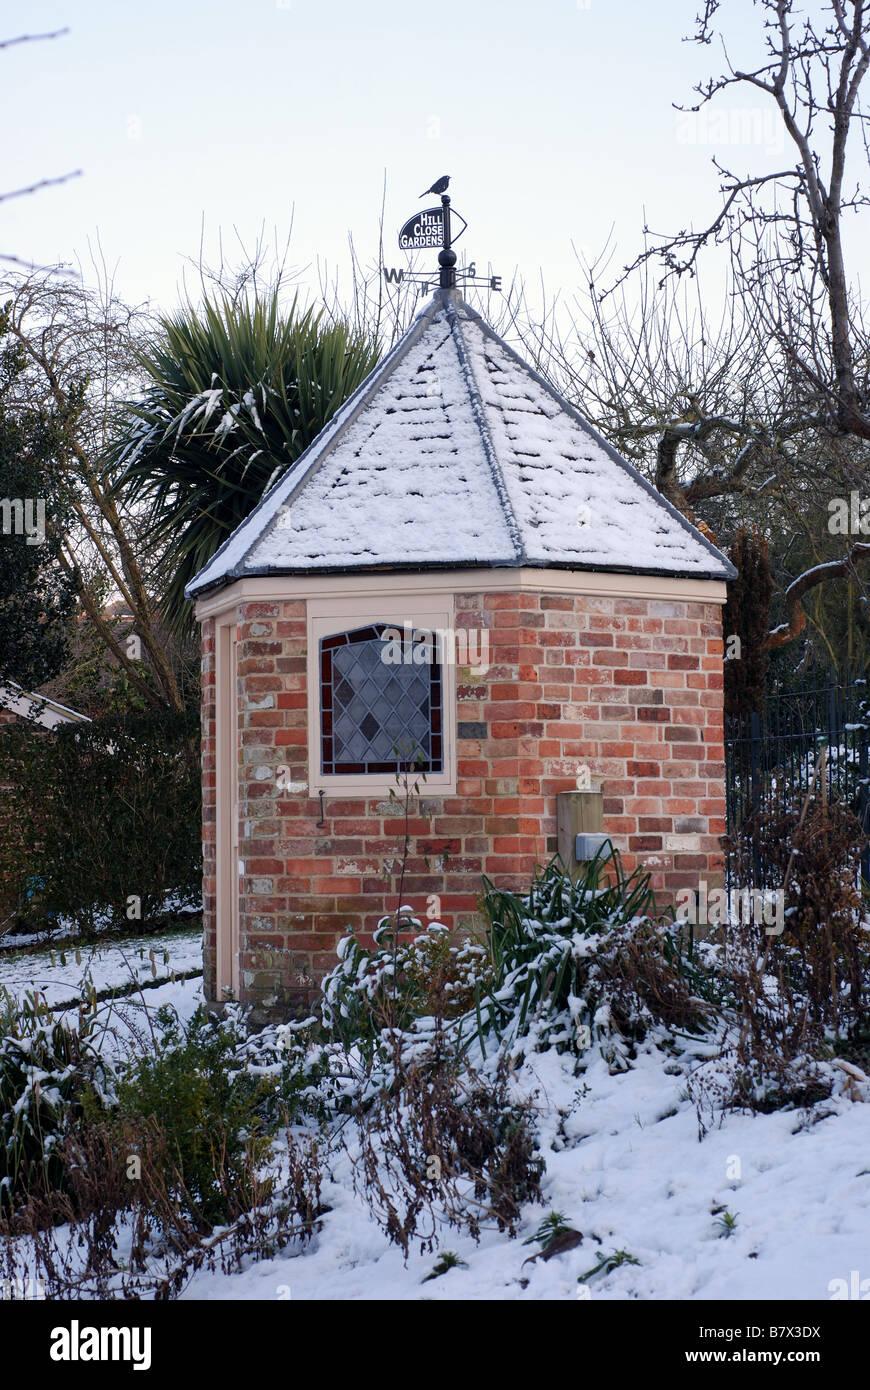 Hill Close Gardens in winter Warwick, Warwickshire, England, UK - Stock Image